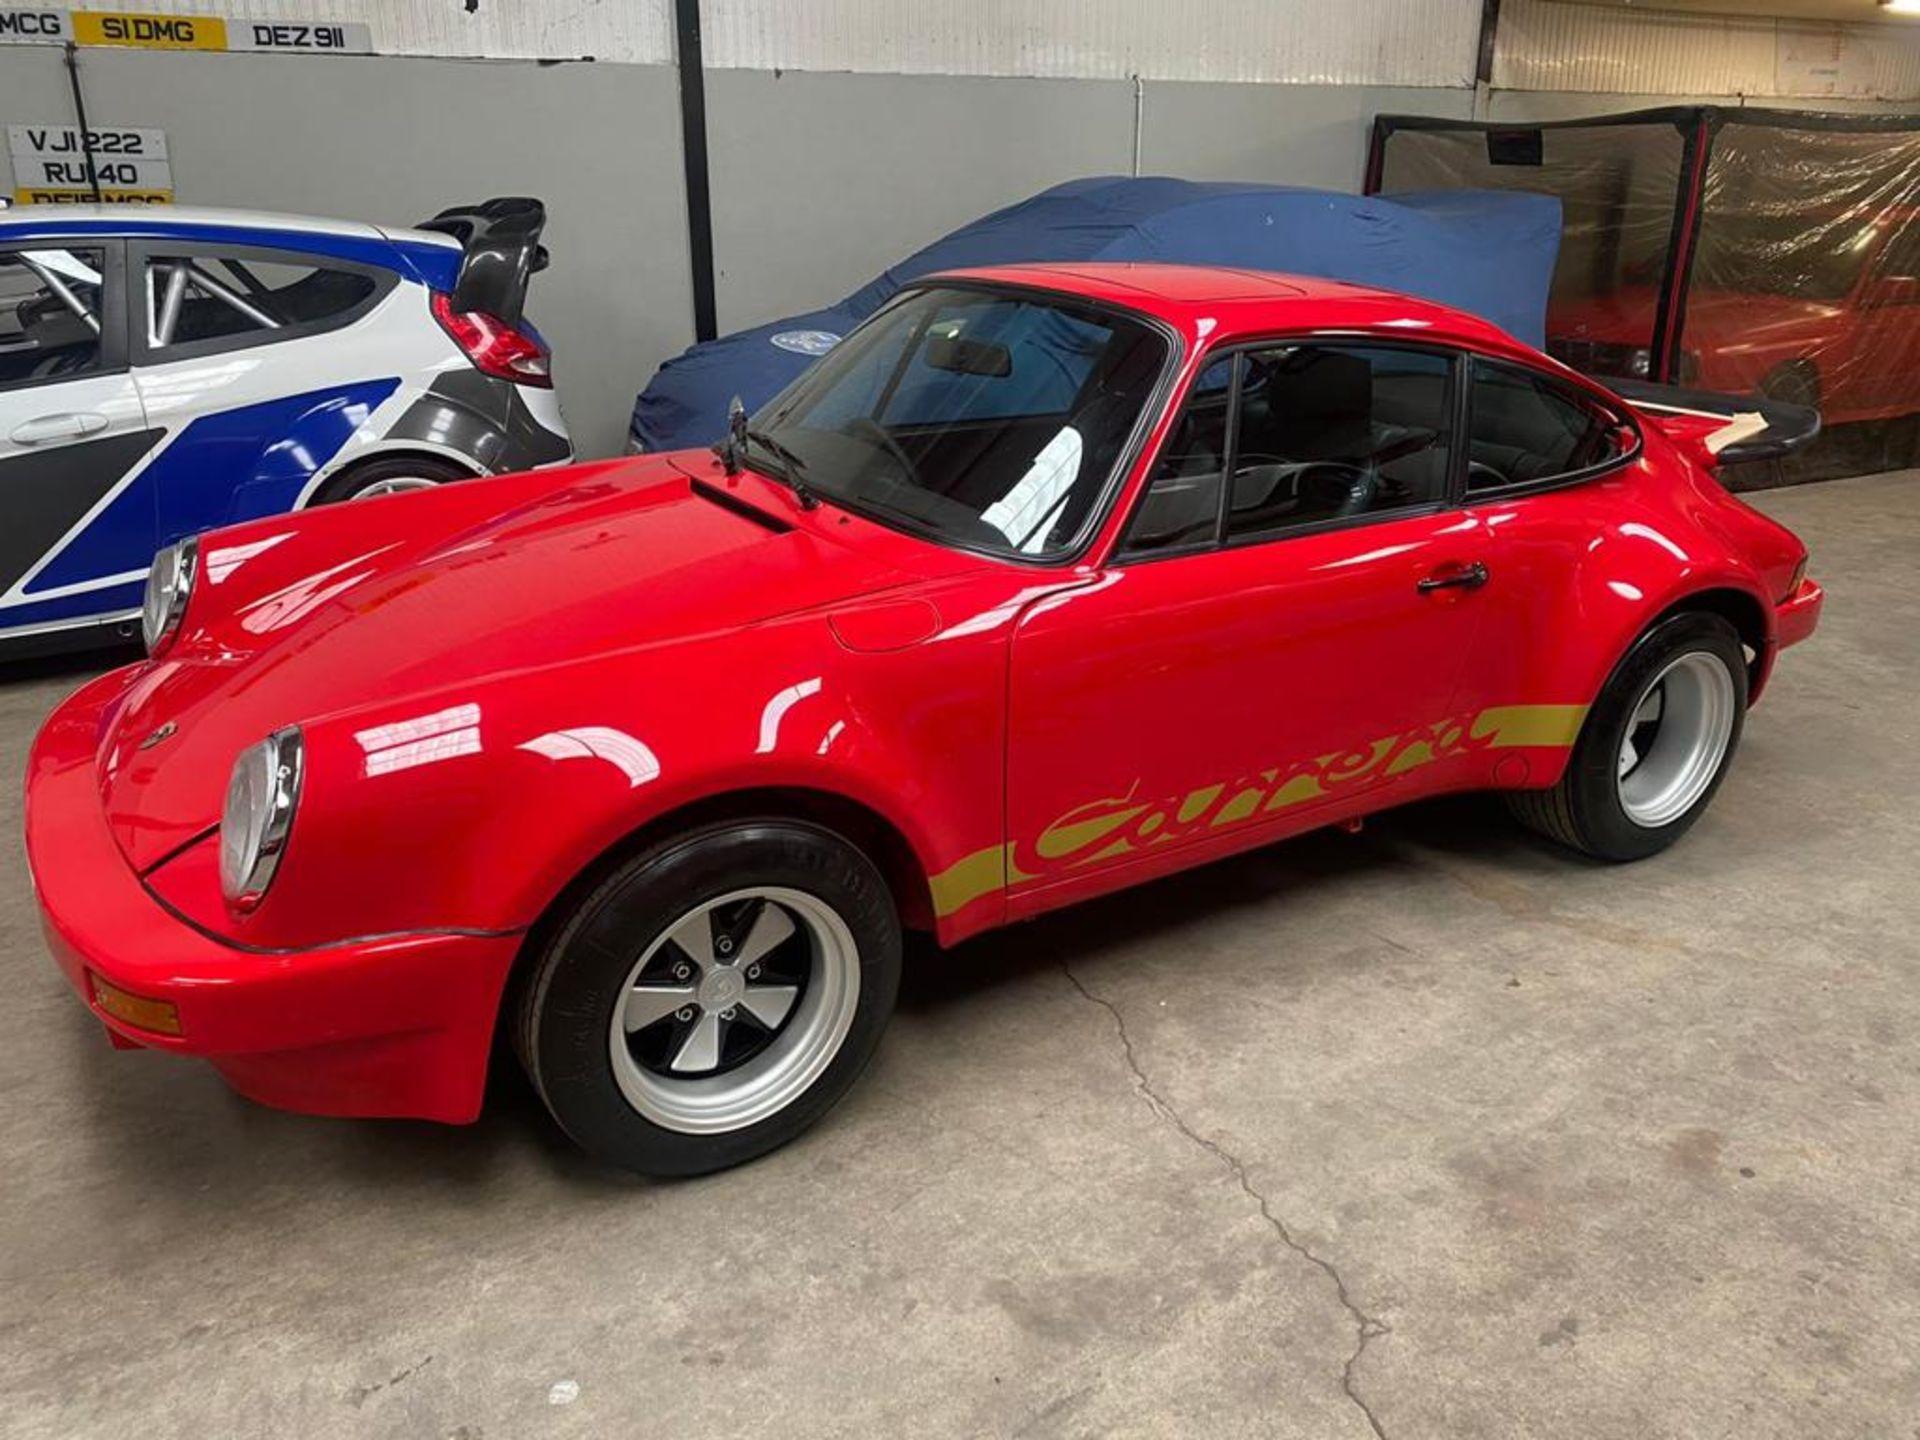 1980 Porsche 911 sc sport but has been fully rebuilt to be identical to a 1974 911 rsr *NO VAT*